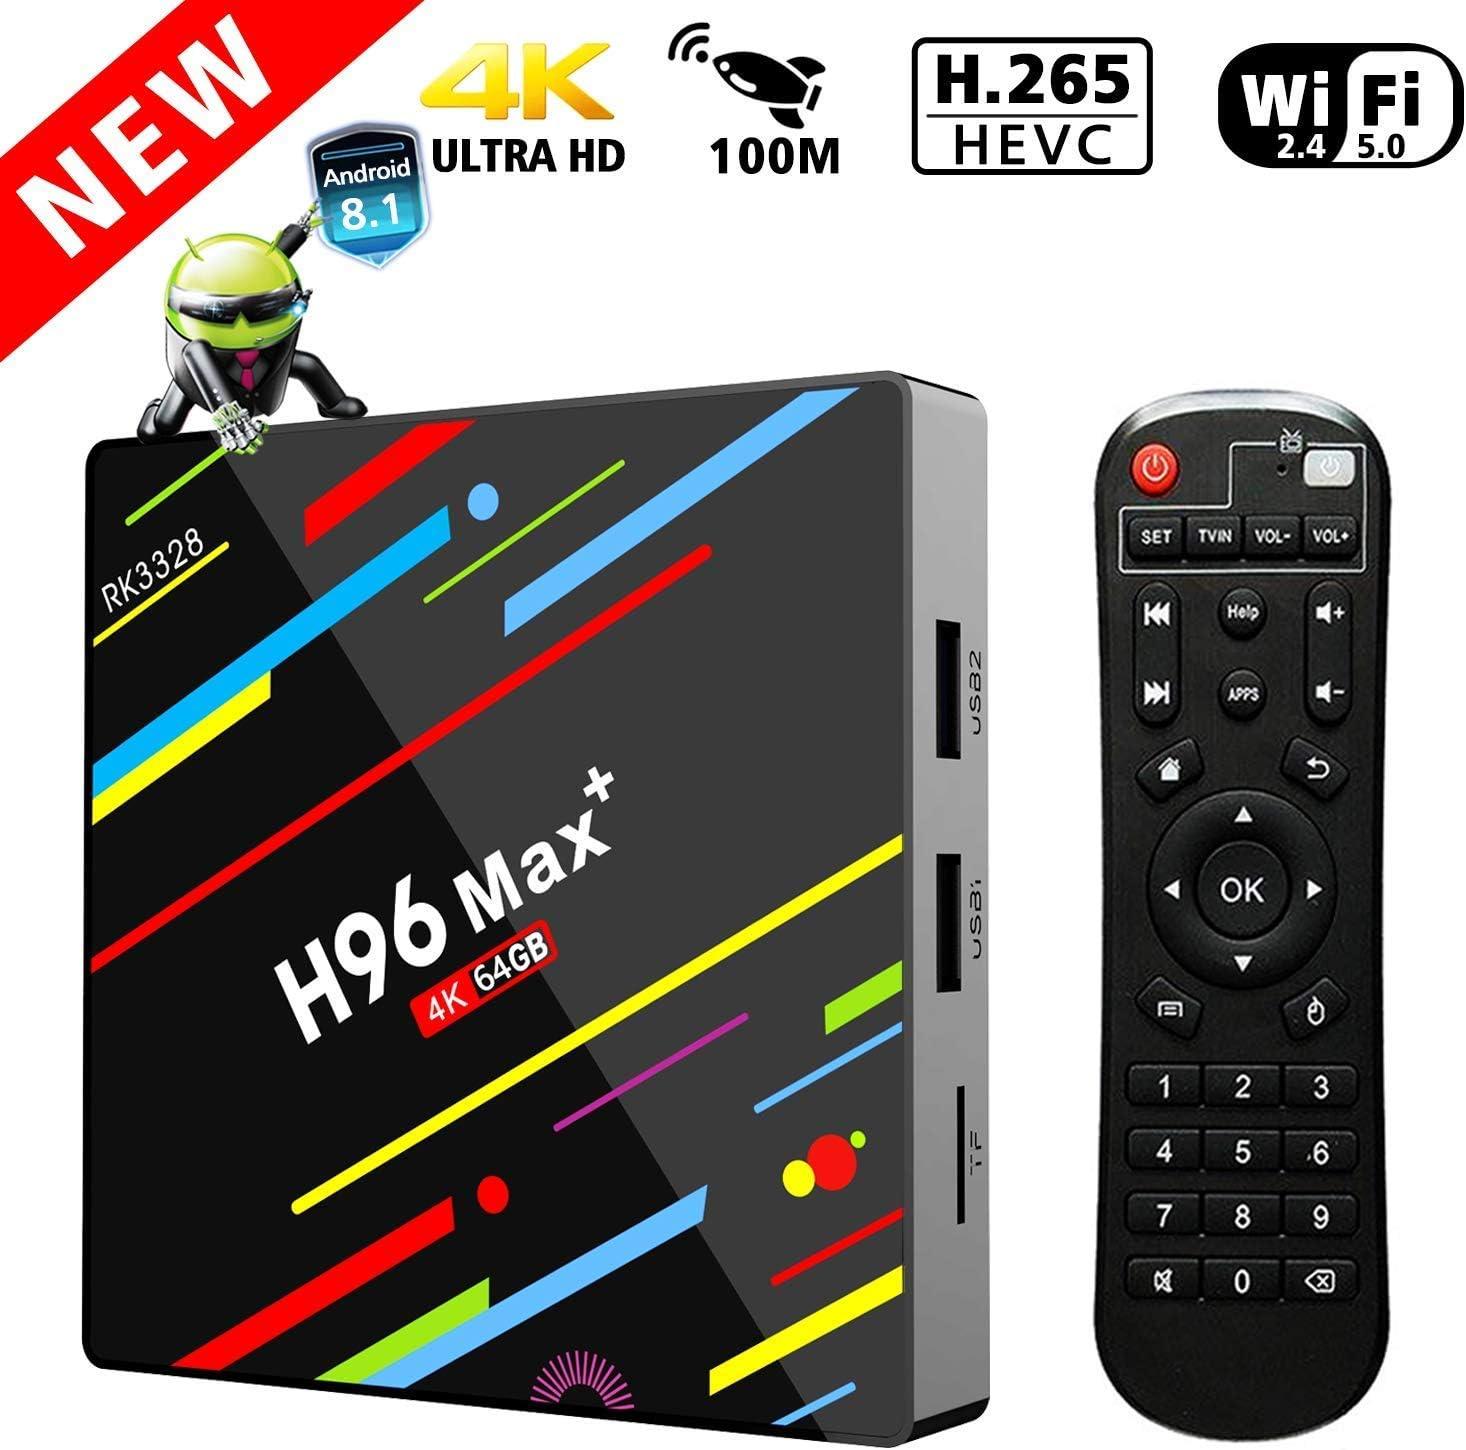 TV Box 4G 64GB, Penkou H96 MAX + Android 8.1 Smart TV Box RK3328 Quad-Core 64bit Cortex-A53 4 GB 64G Penta-Core Mali-450 hasta 750Mhz + Caja de Regalo Full HD / H.265 /